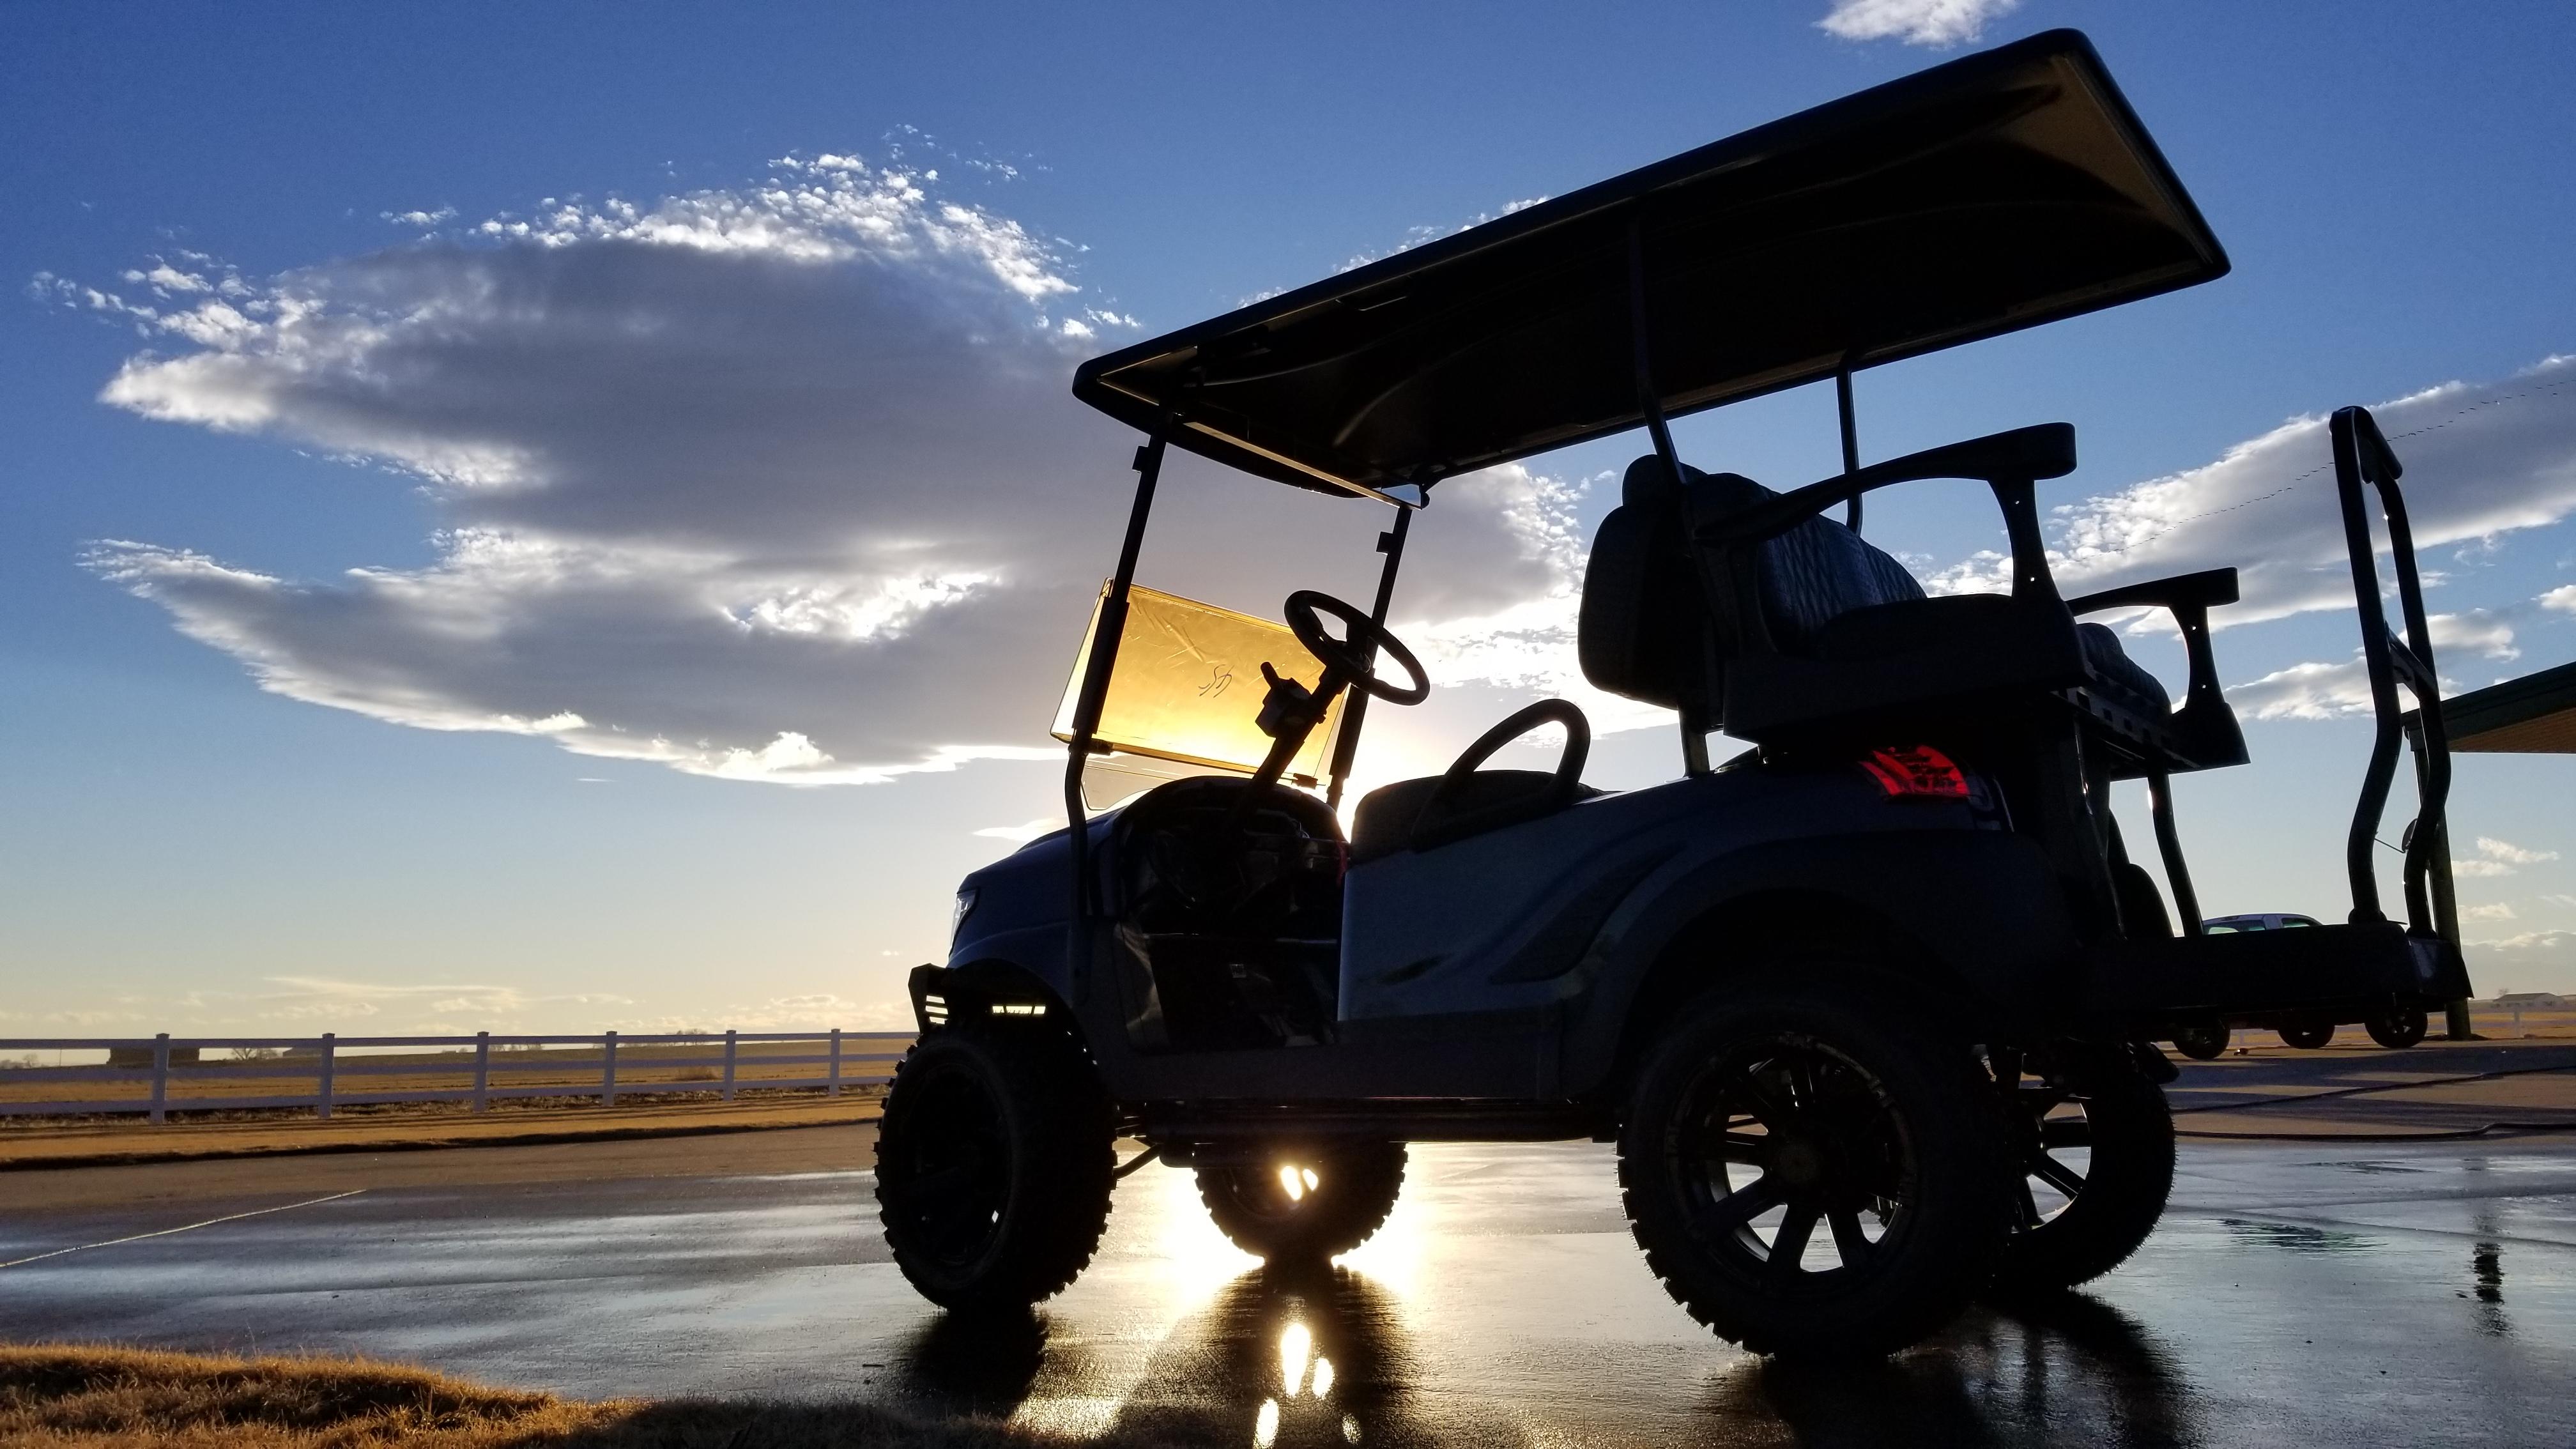 Custom Golf Carts In Colorado - Colorado Kustom Carts - Blog on golf cart safety program, parking lot safety policy, golf cart safety rules, golf cart cartoons safety, golf cart safety training, loading dock safety policy, golf cart safety presentation, golf cart safety procedures, golf cart safety standards, golf carts hospital, golf cart safety tips,